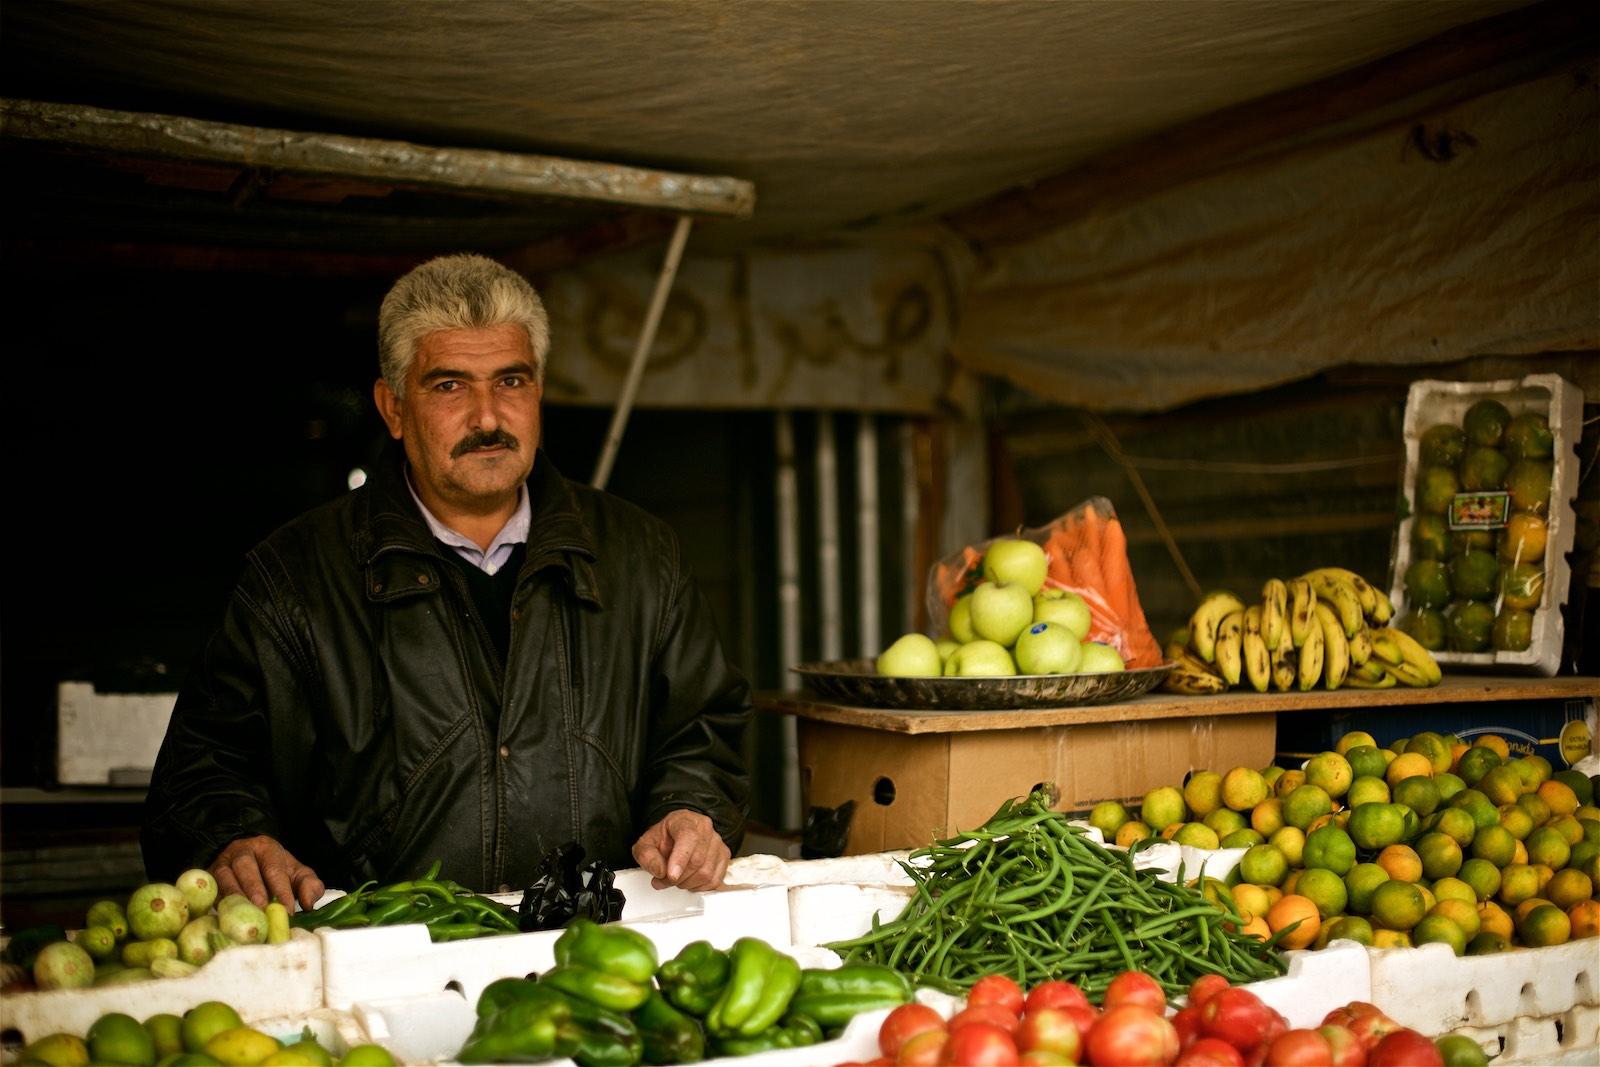 malawi-dzaleka-denis-bosnic-refugee-camp-jrs-jesuit-refugee-service- (1).jpg